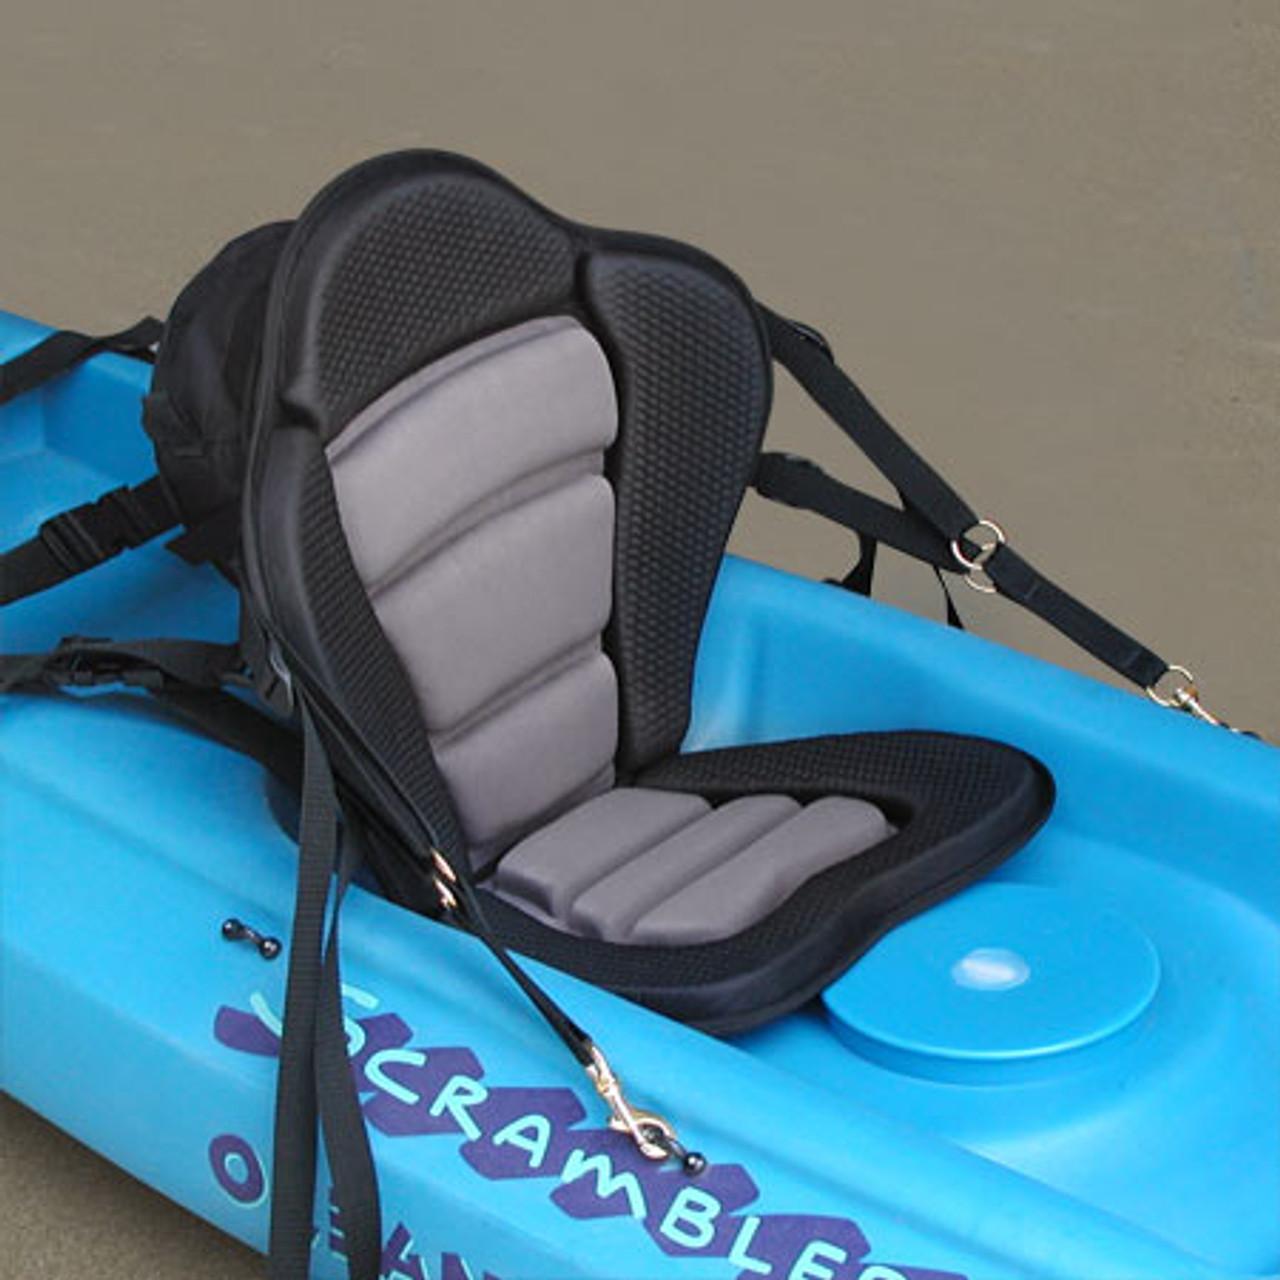 http://www.surftosummit.com/images/products/KGT310p2.jpg